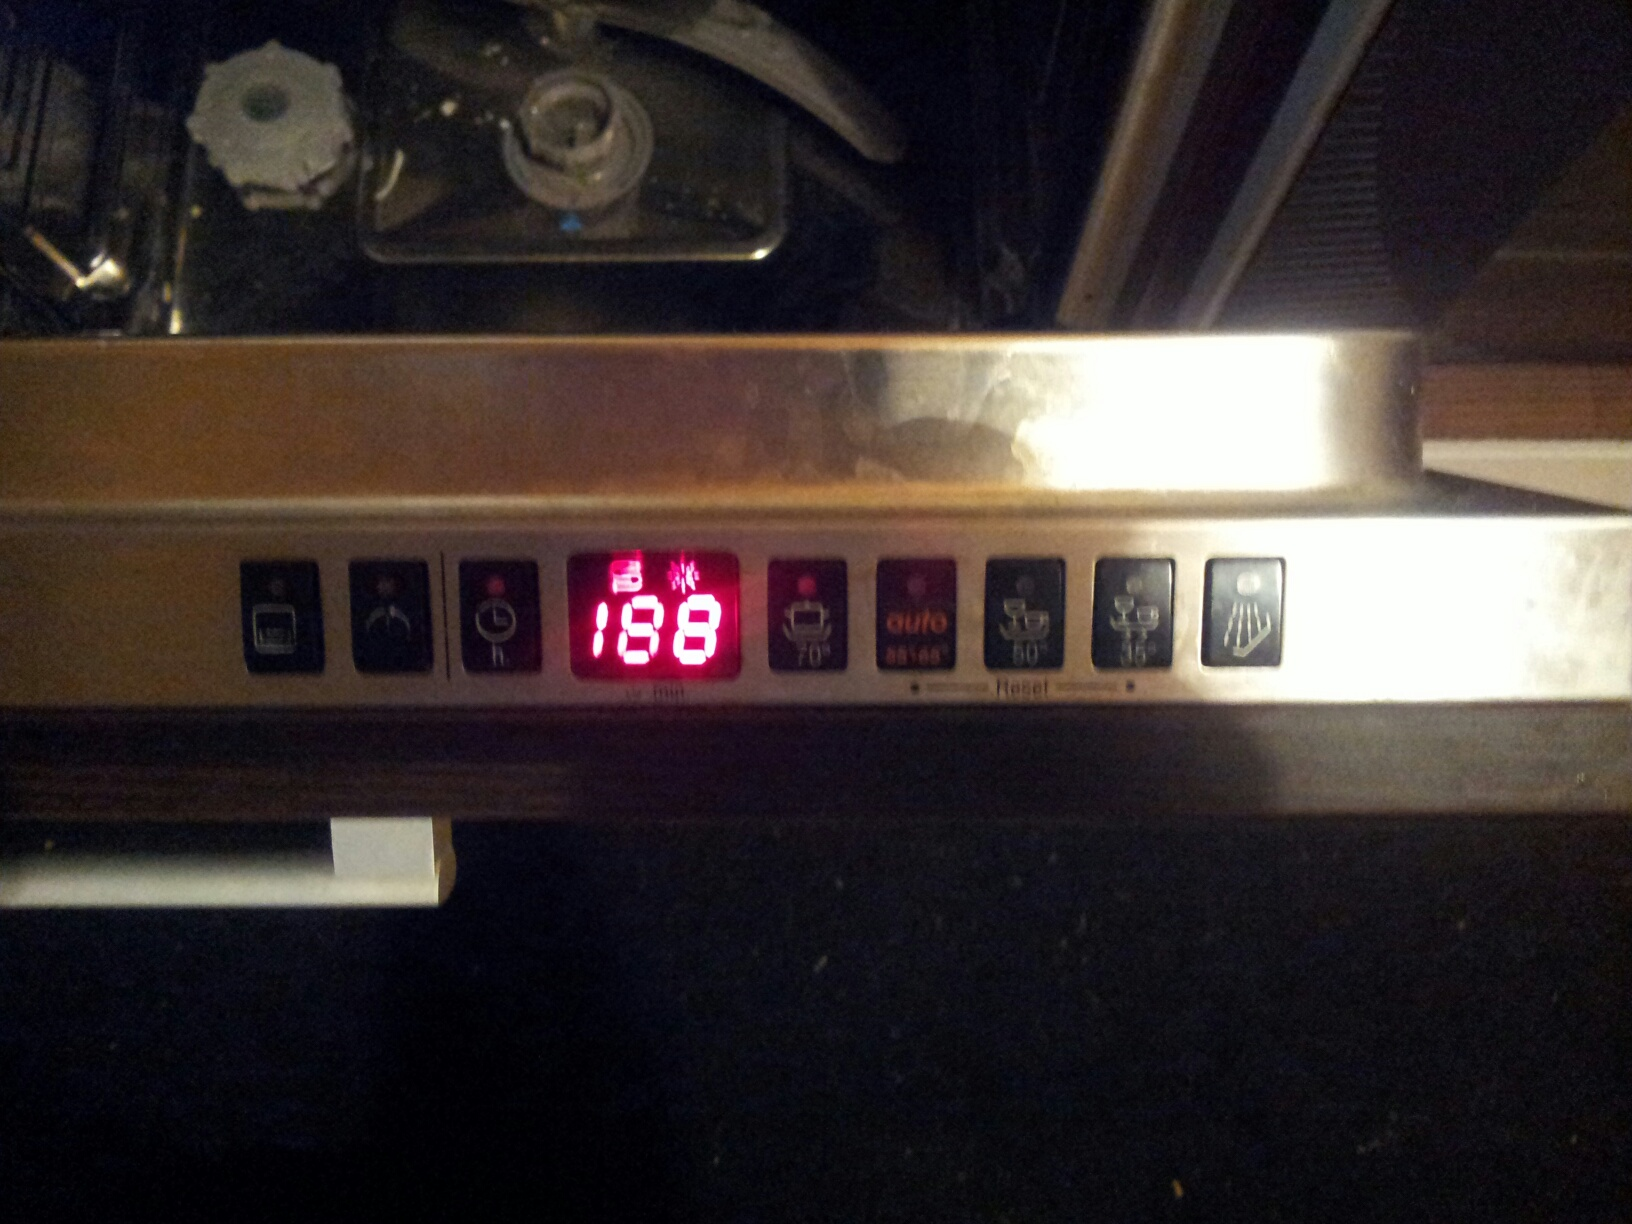 zmywarka Bosch SGI5635EU nie chce si� zrestartowa�